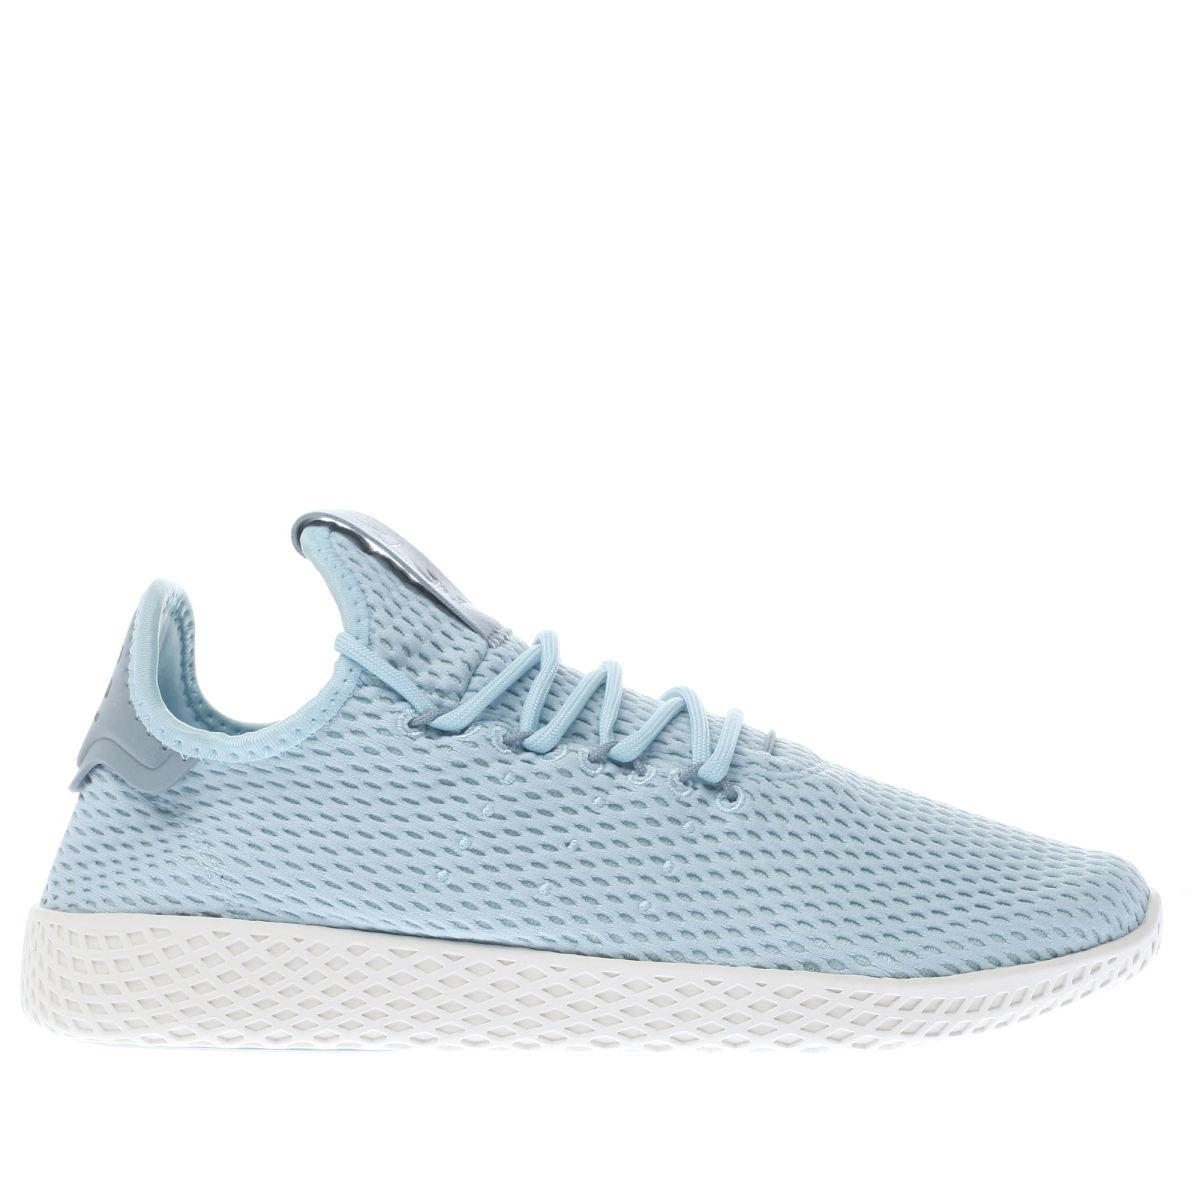 adidas pale blue pharrell williams tennis hu trainers